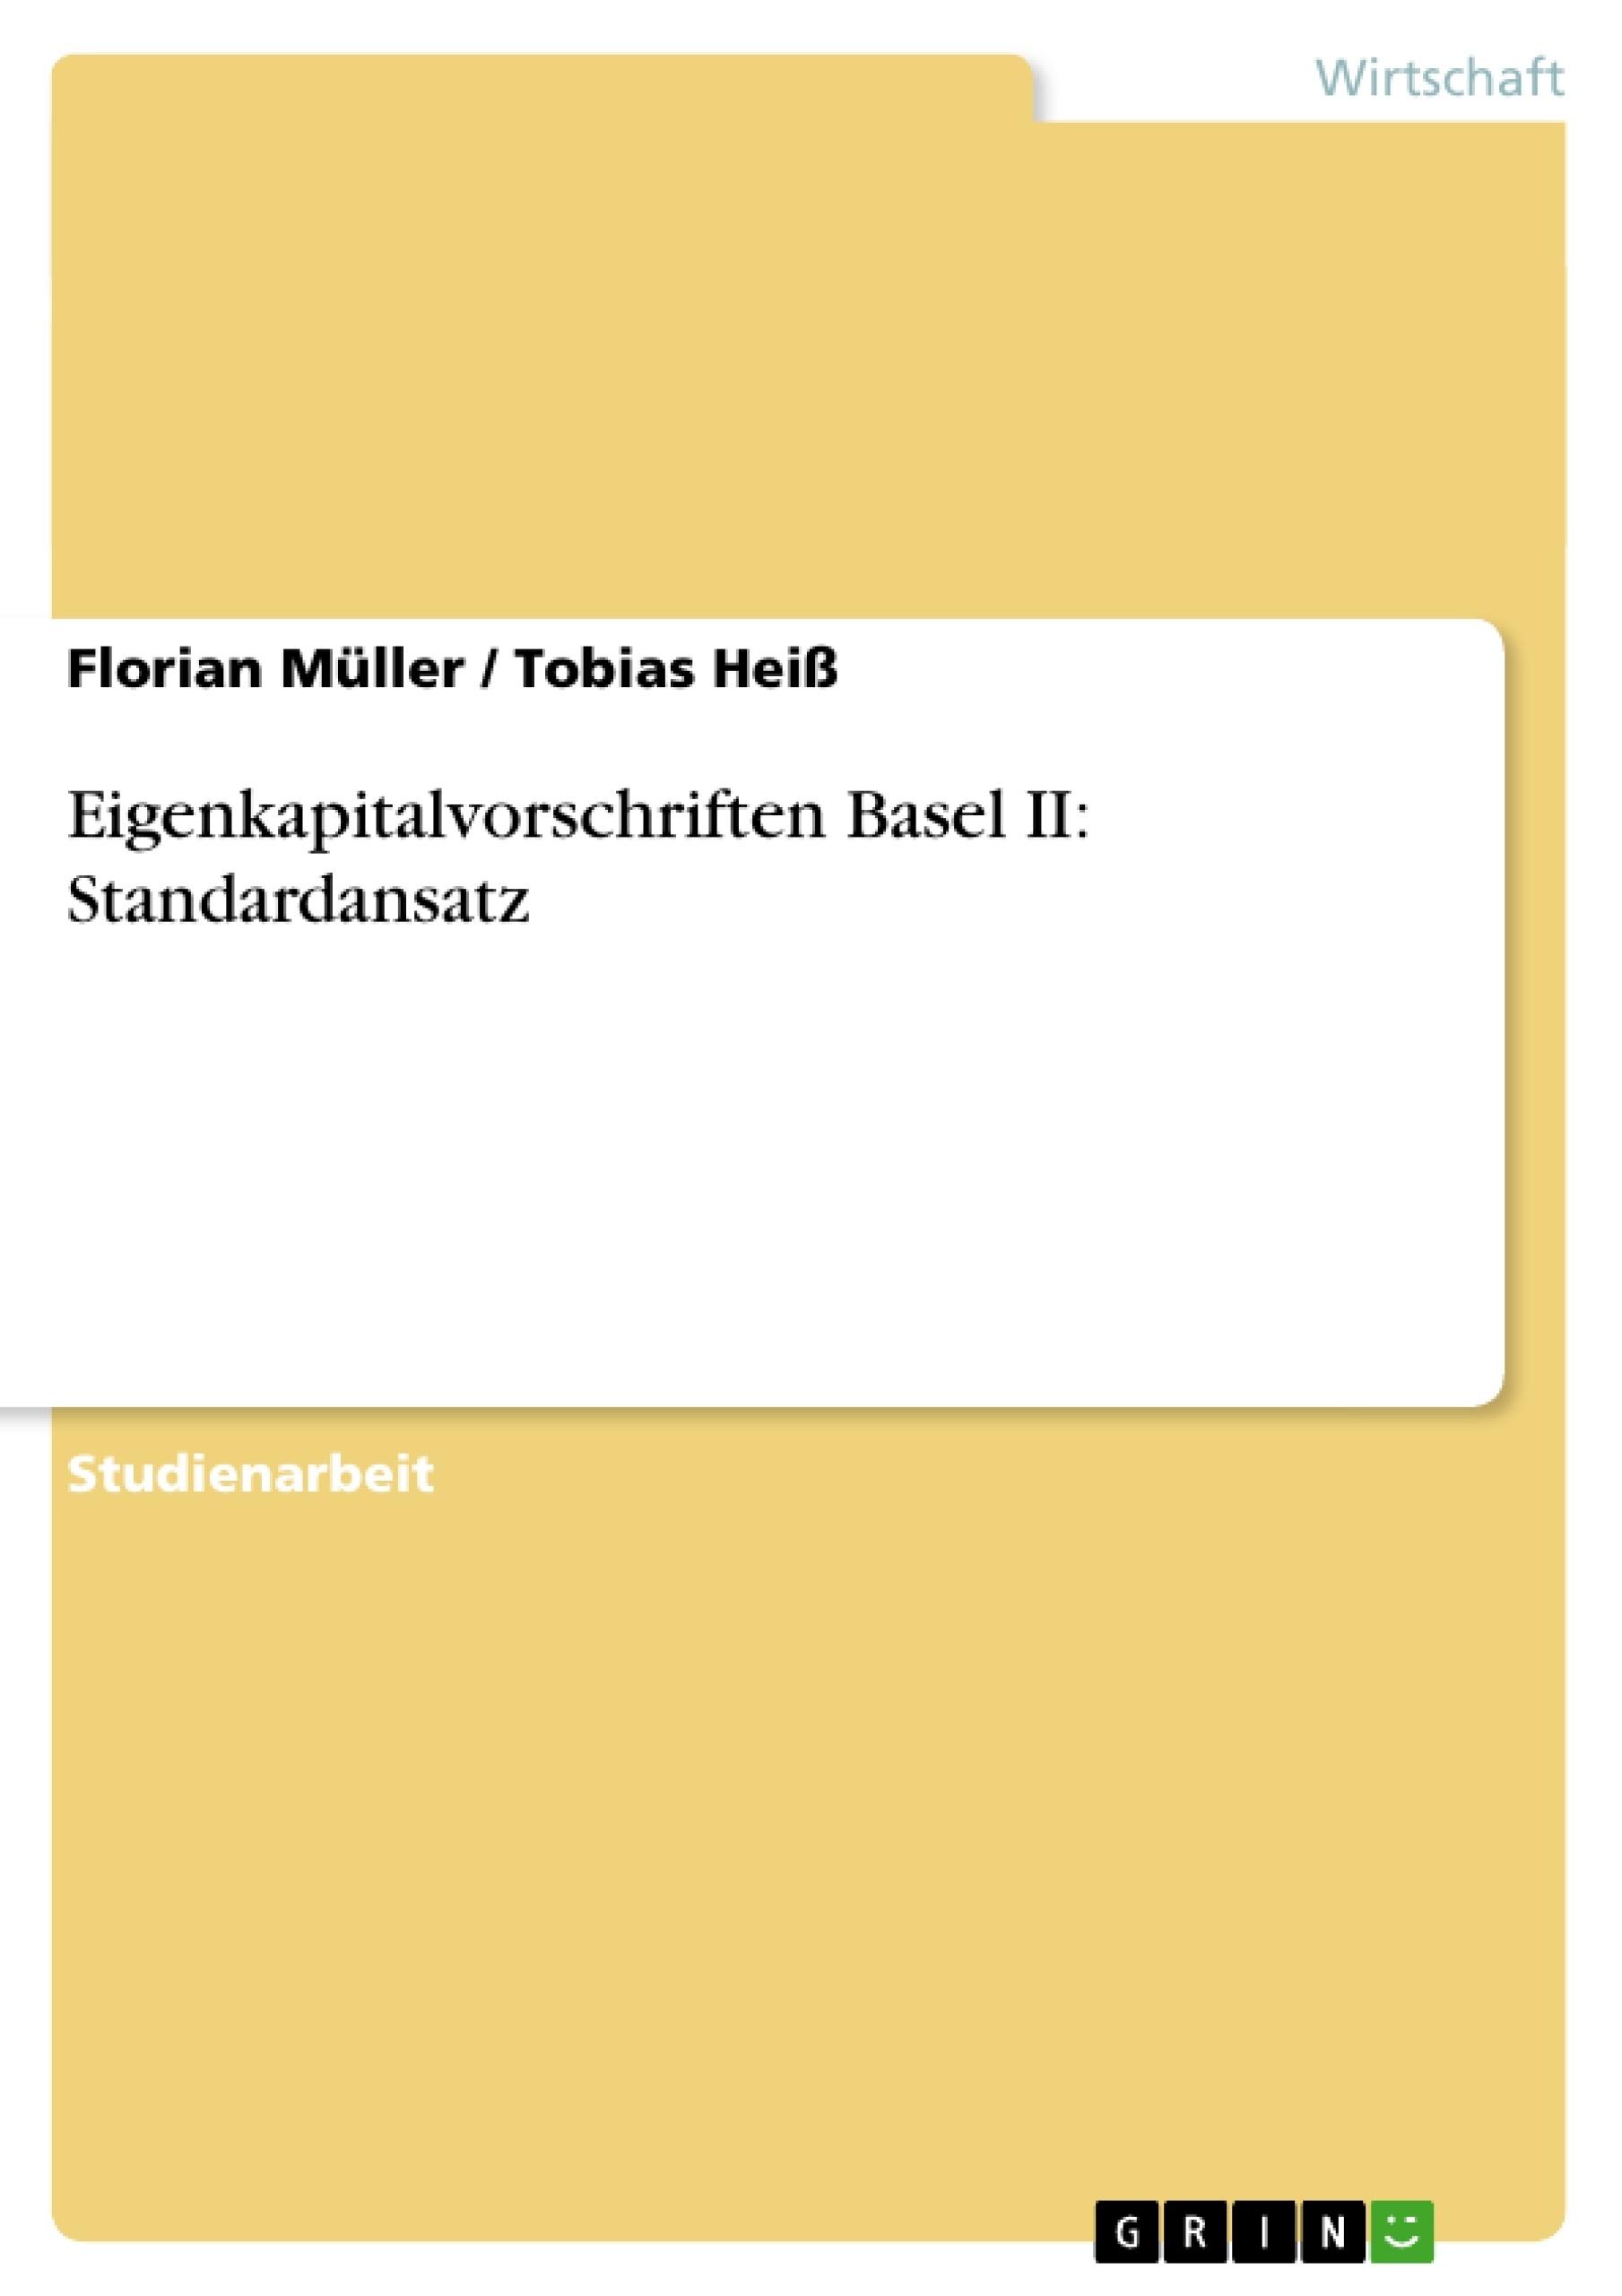 Titel: Eigenkapitalvorschriften Basel II: Standardansatz